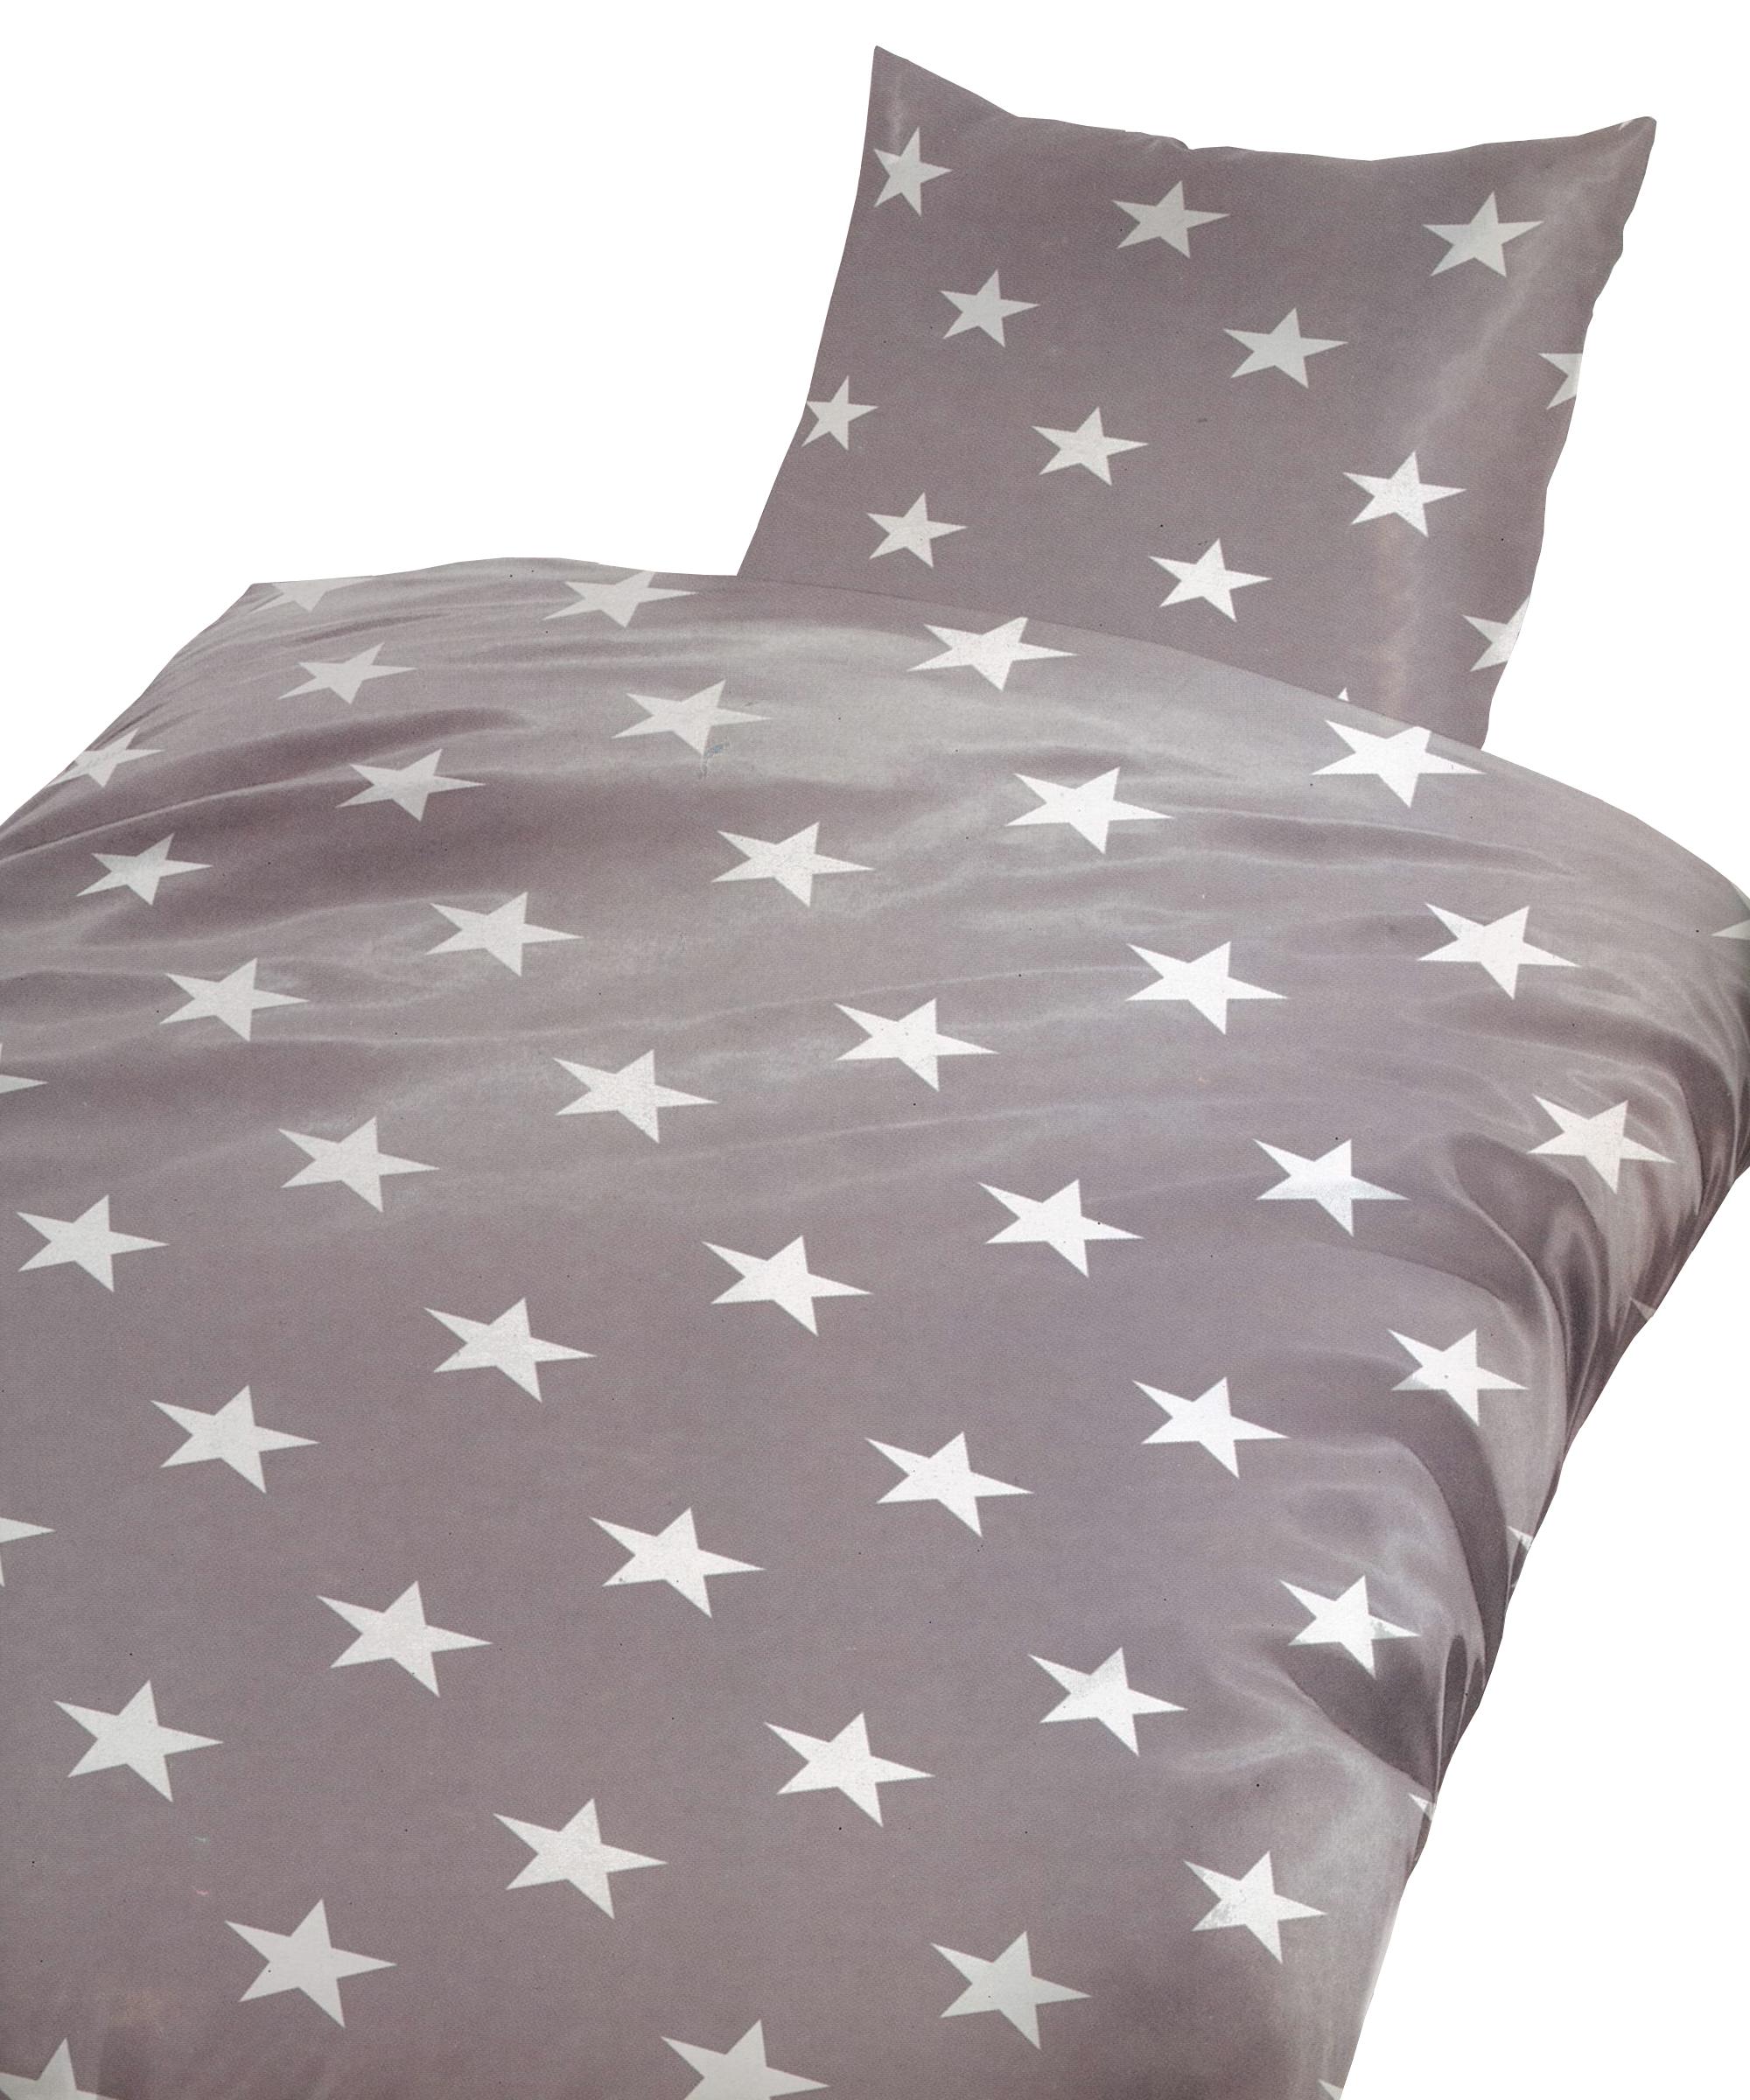 5 tlg baumwolle biber bettw sche 135x200cm sterne grau. Black Bedroom Furniture Sets. Home Design Ideas